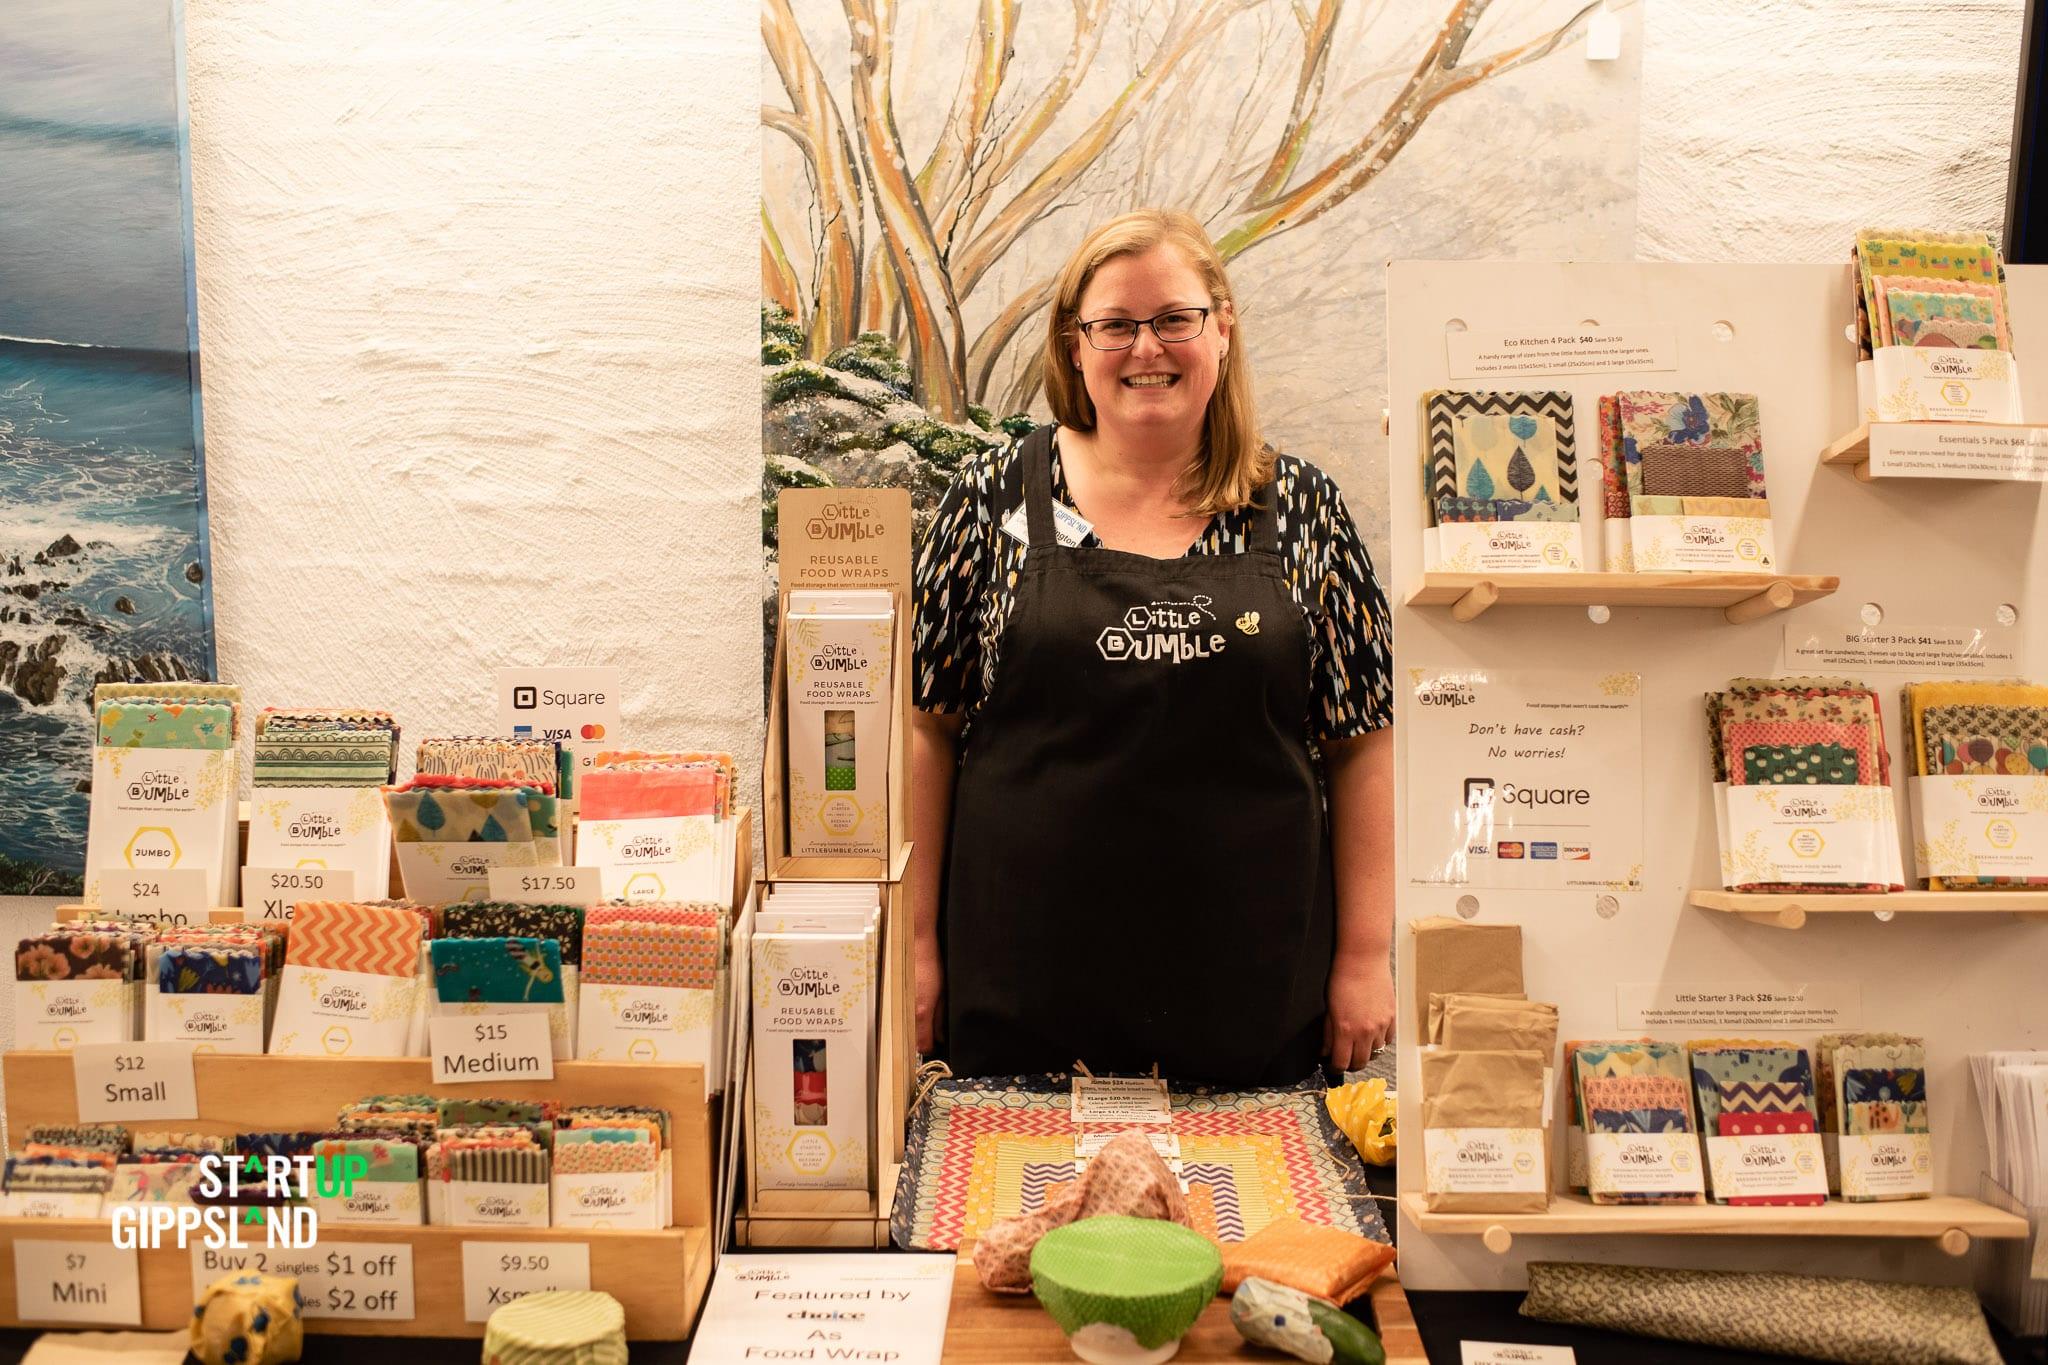 Startup Gippsland Showcase Laura Eddington Little Bumble